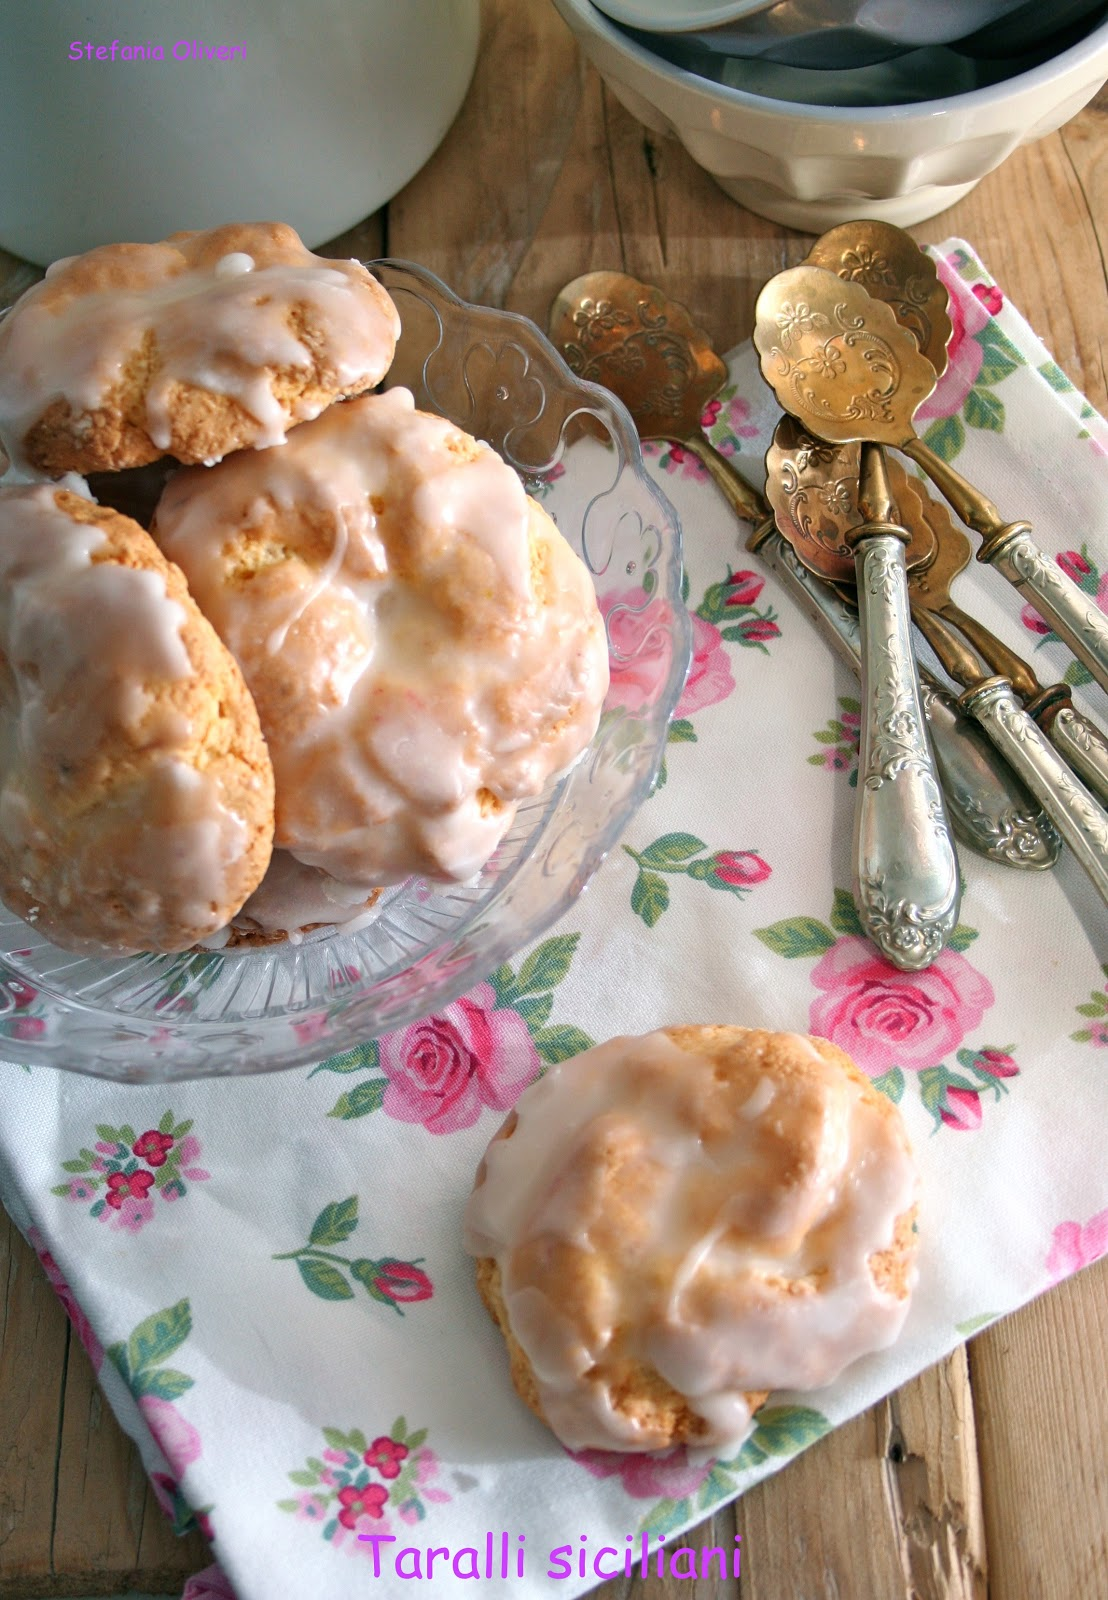 Taralli siciliani, biscotto morbido senza glutine Cardamomo & co